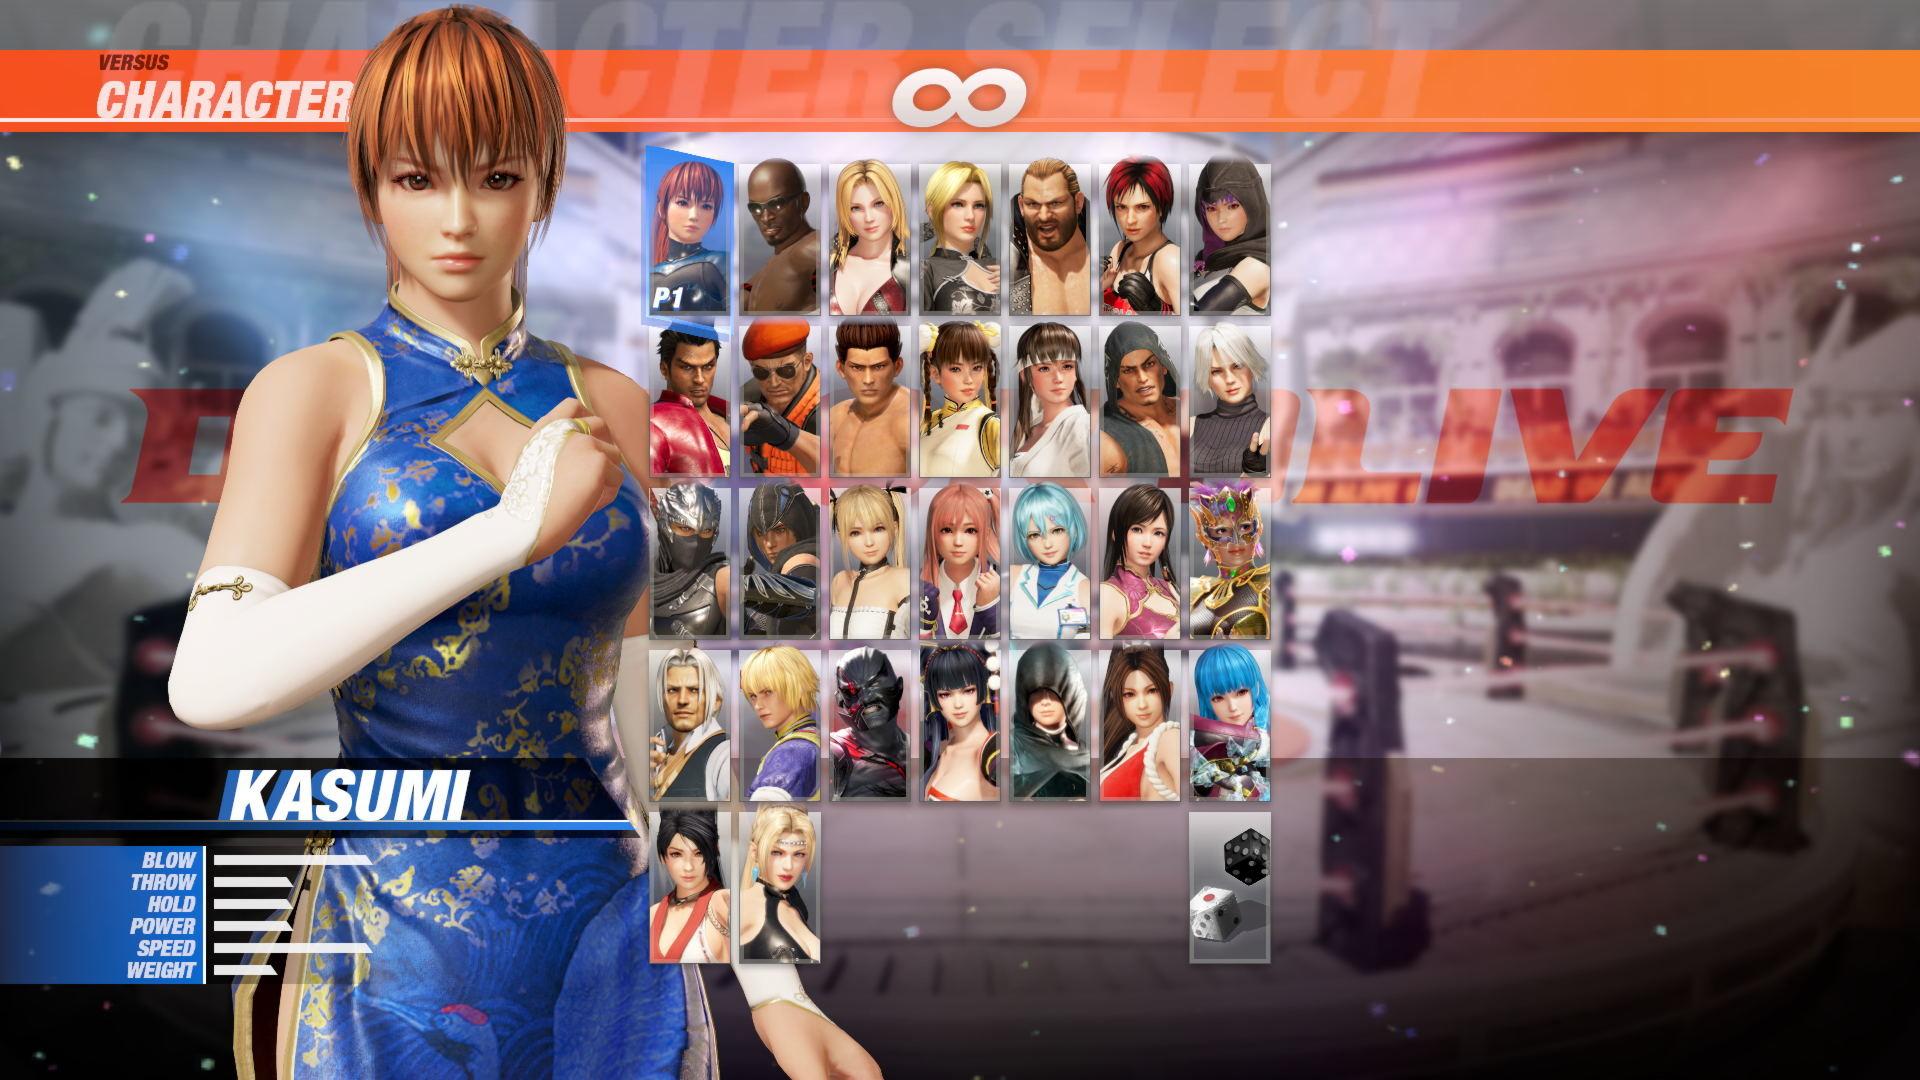 [Revival] DOA6 Alluring Mandarin Dress - Kasumi screenshot